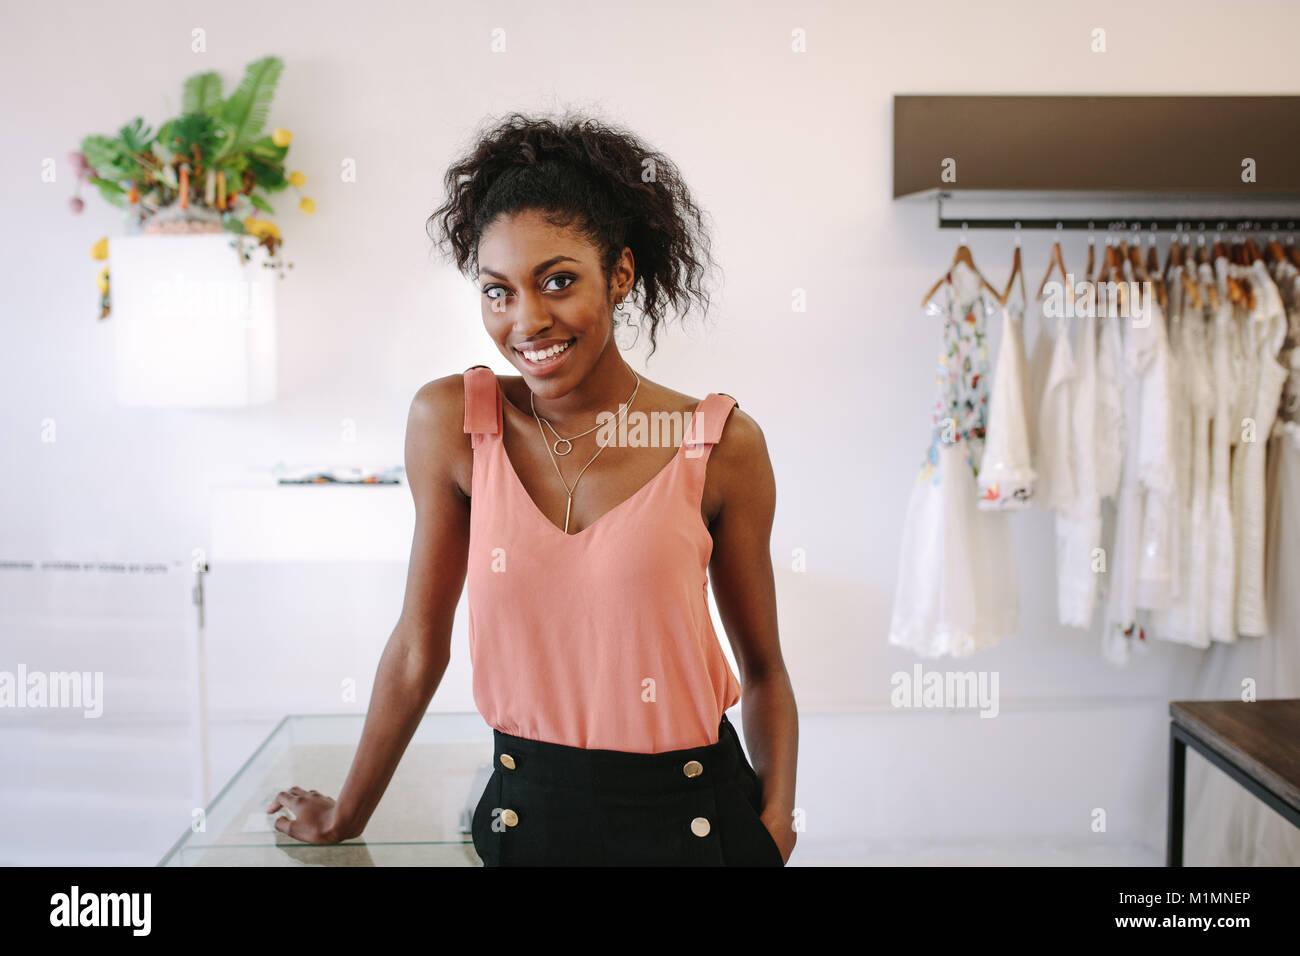 Female fashion designer standing at her desk in her boutique. Female dress designer in her cloth shop with designer - Stock Image